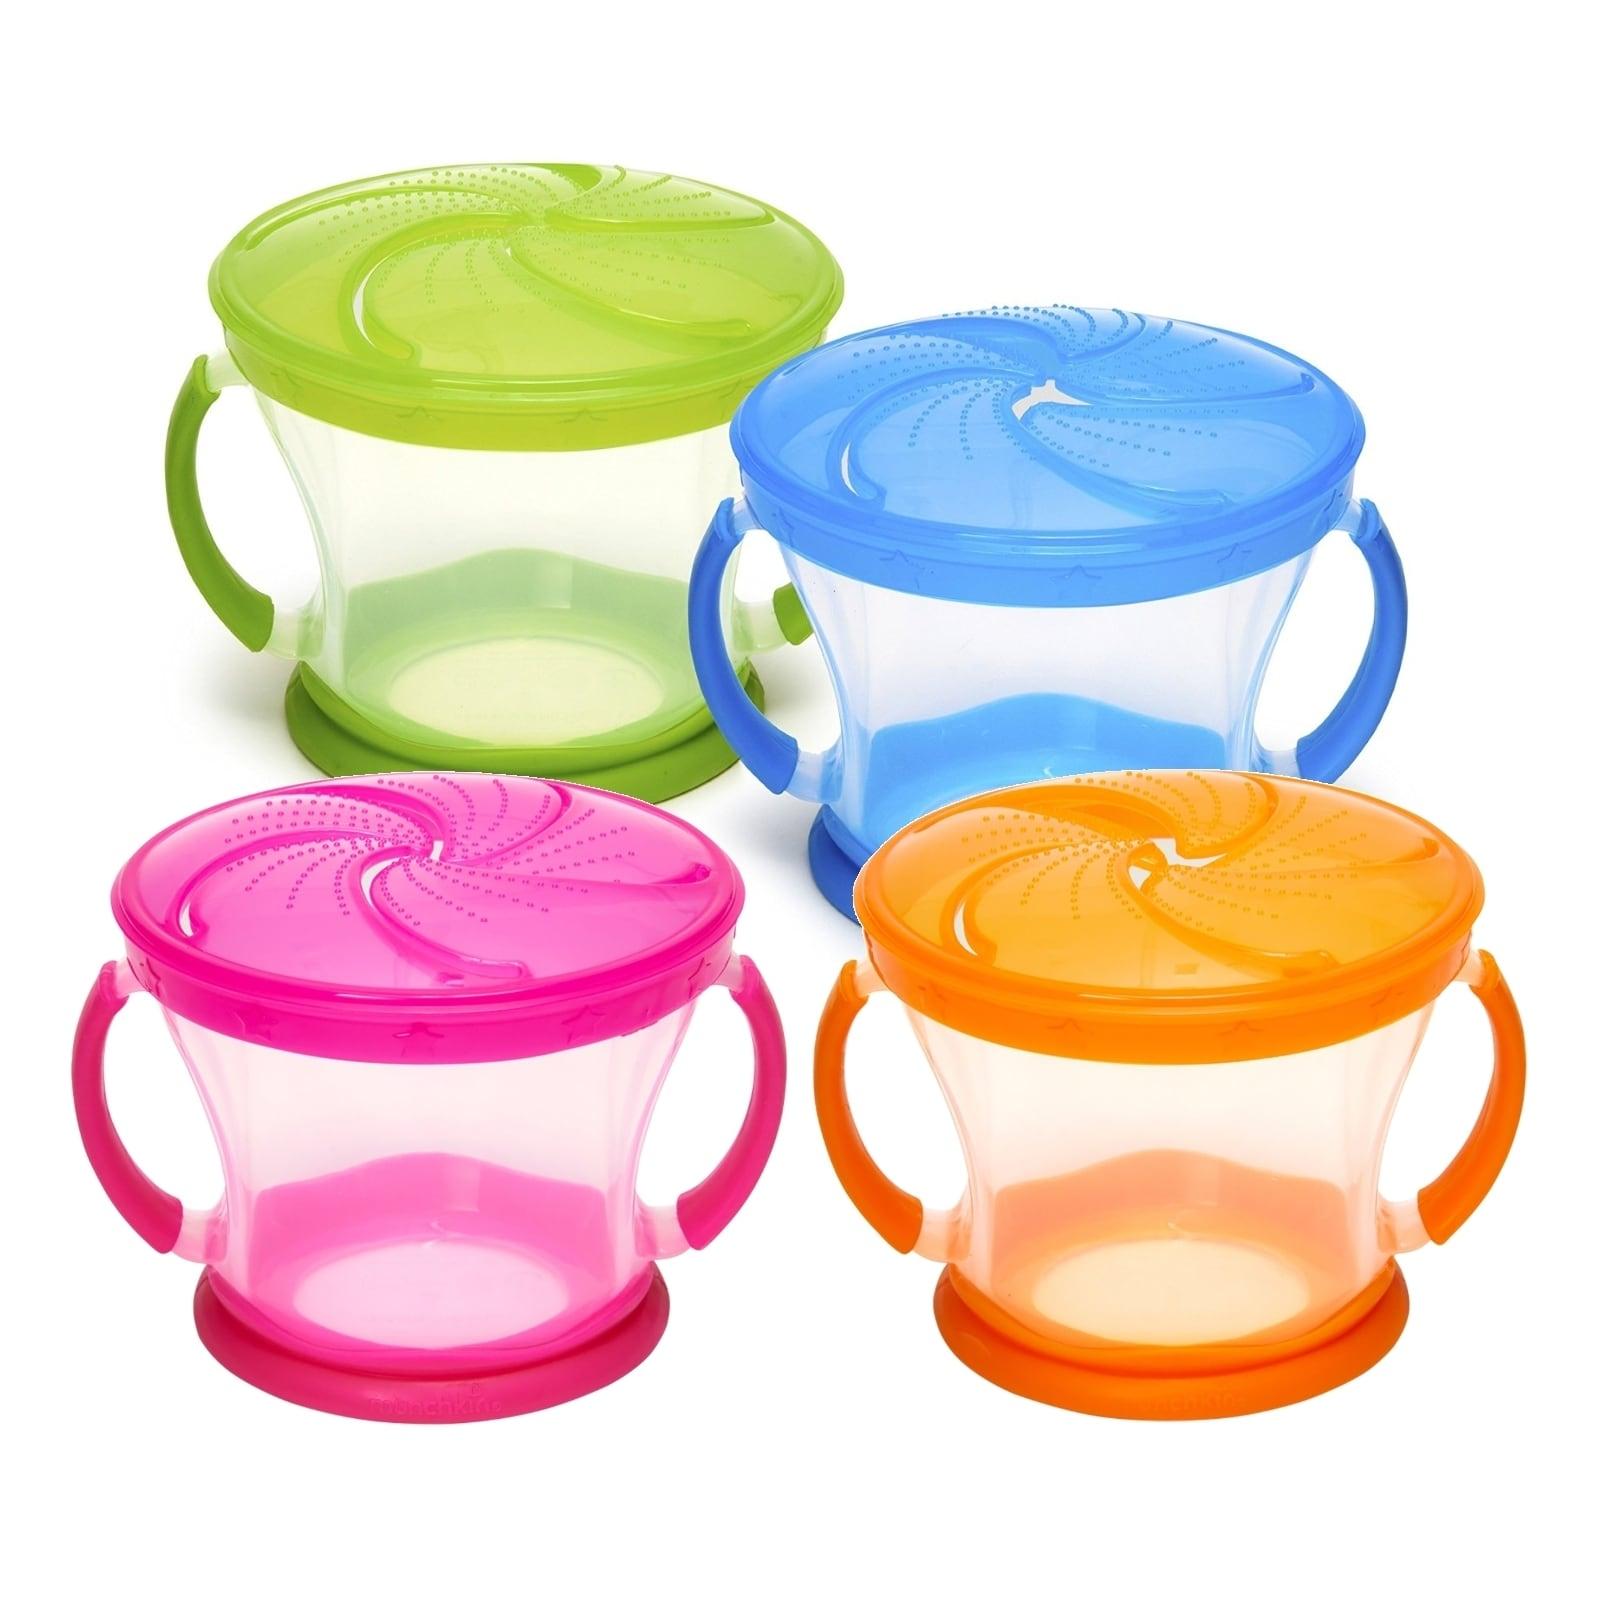 Munchkin  9 Ounce Snack Catcher - Pink/Orange/Blue/Green - 4 Count